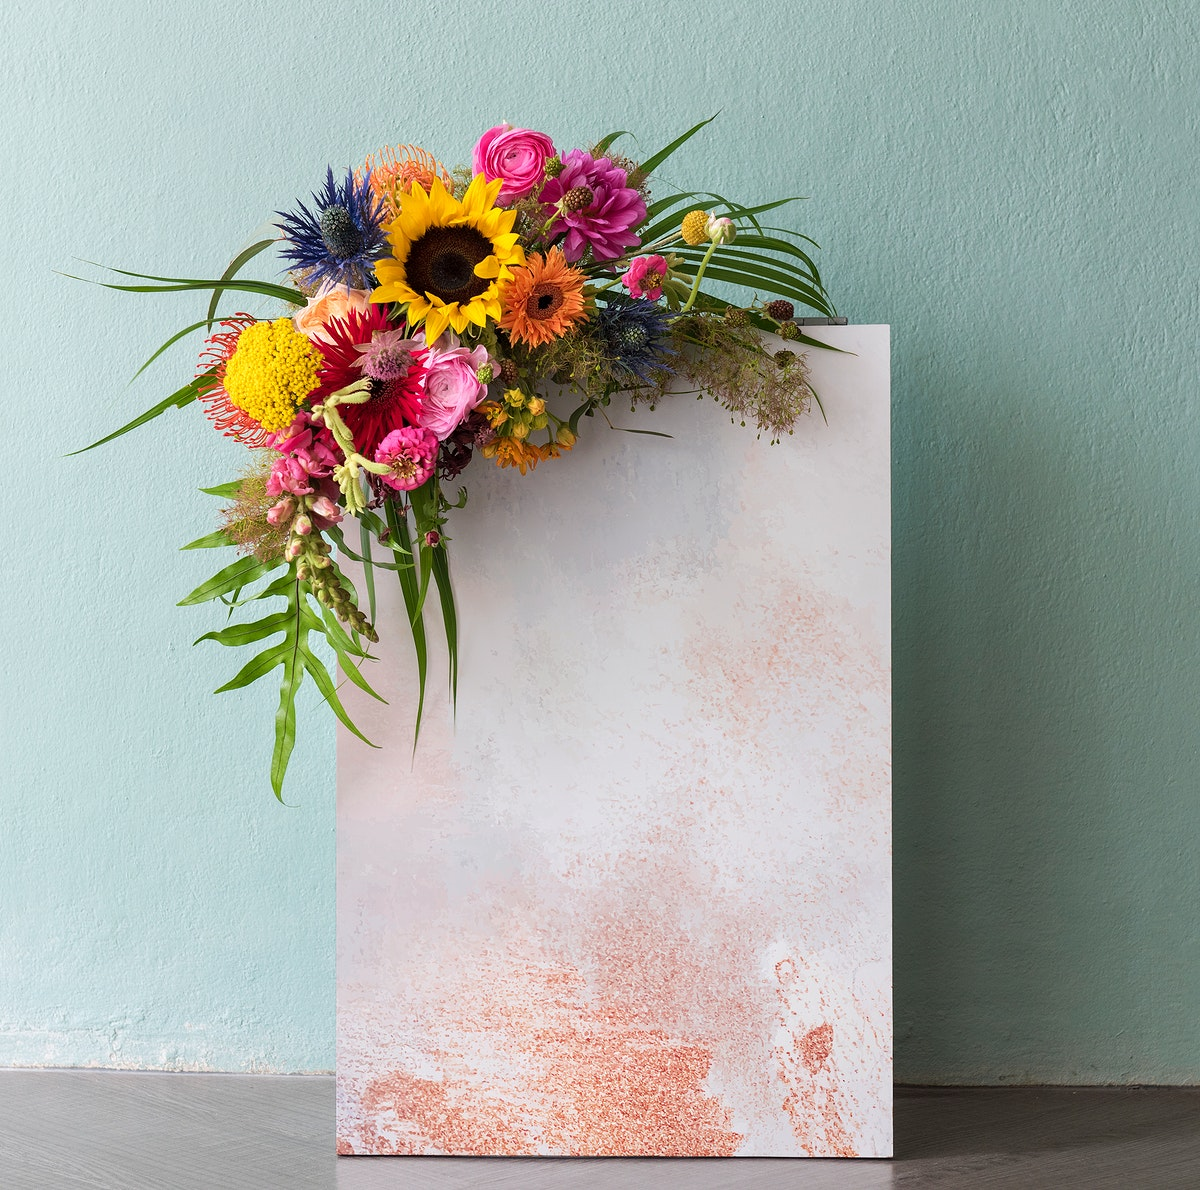 Blank blooming floral board mockup design